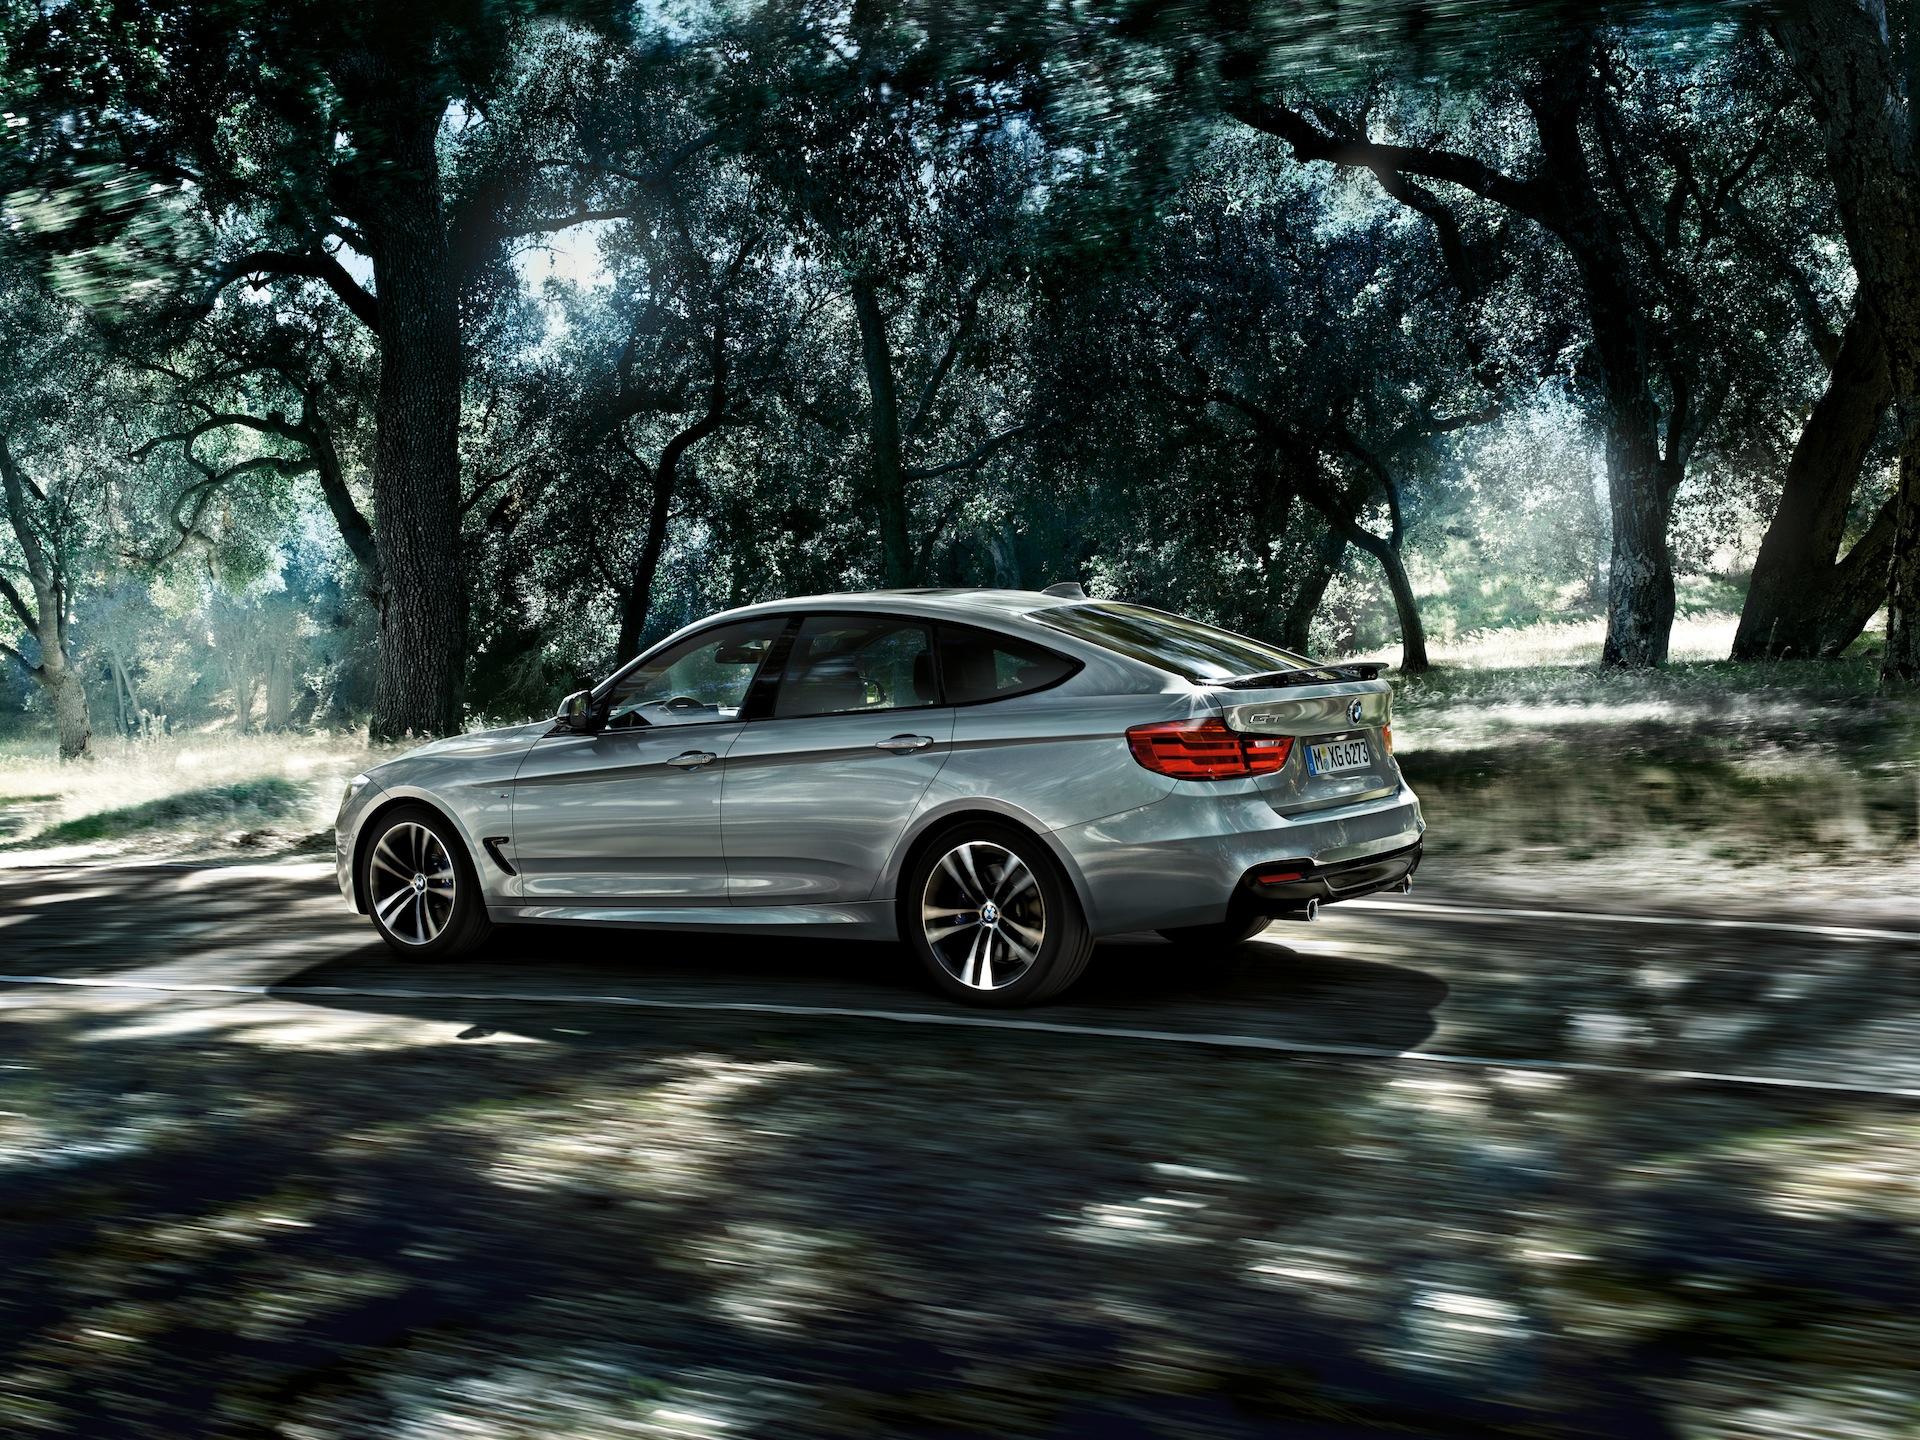 Wallpapers: BMW 3 Series Gran Turismo